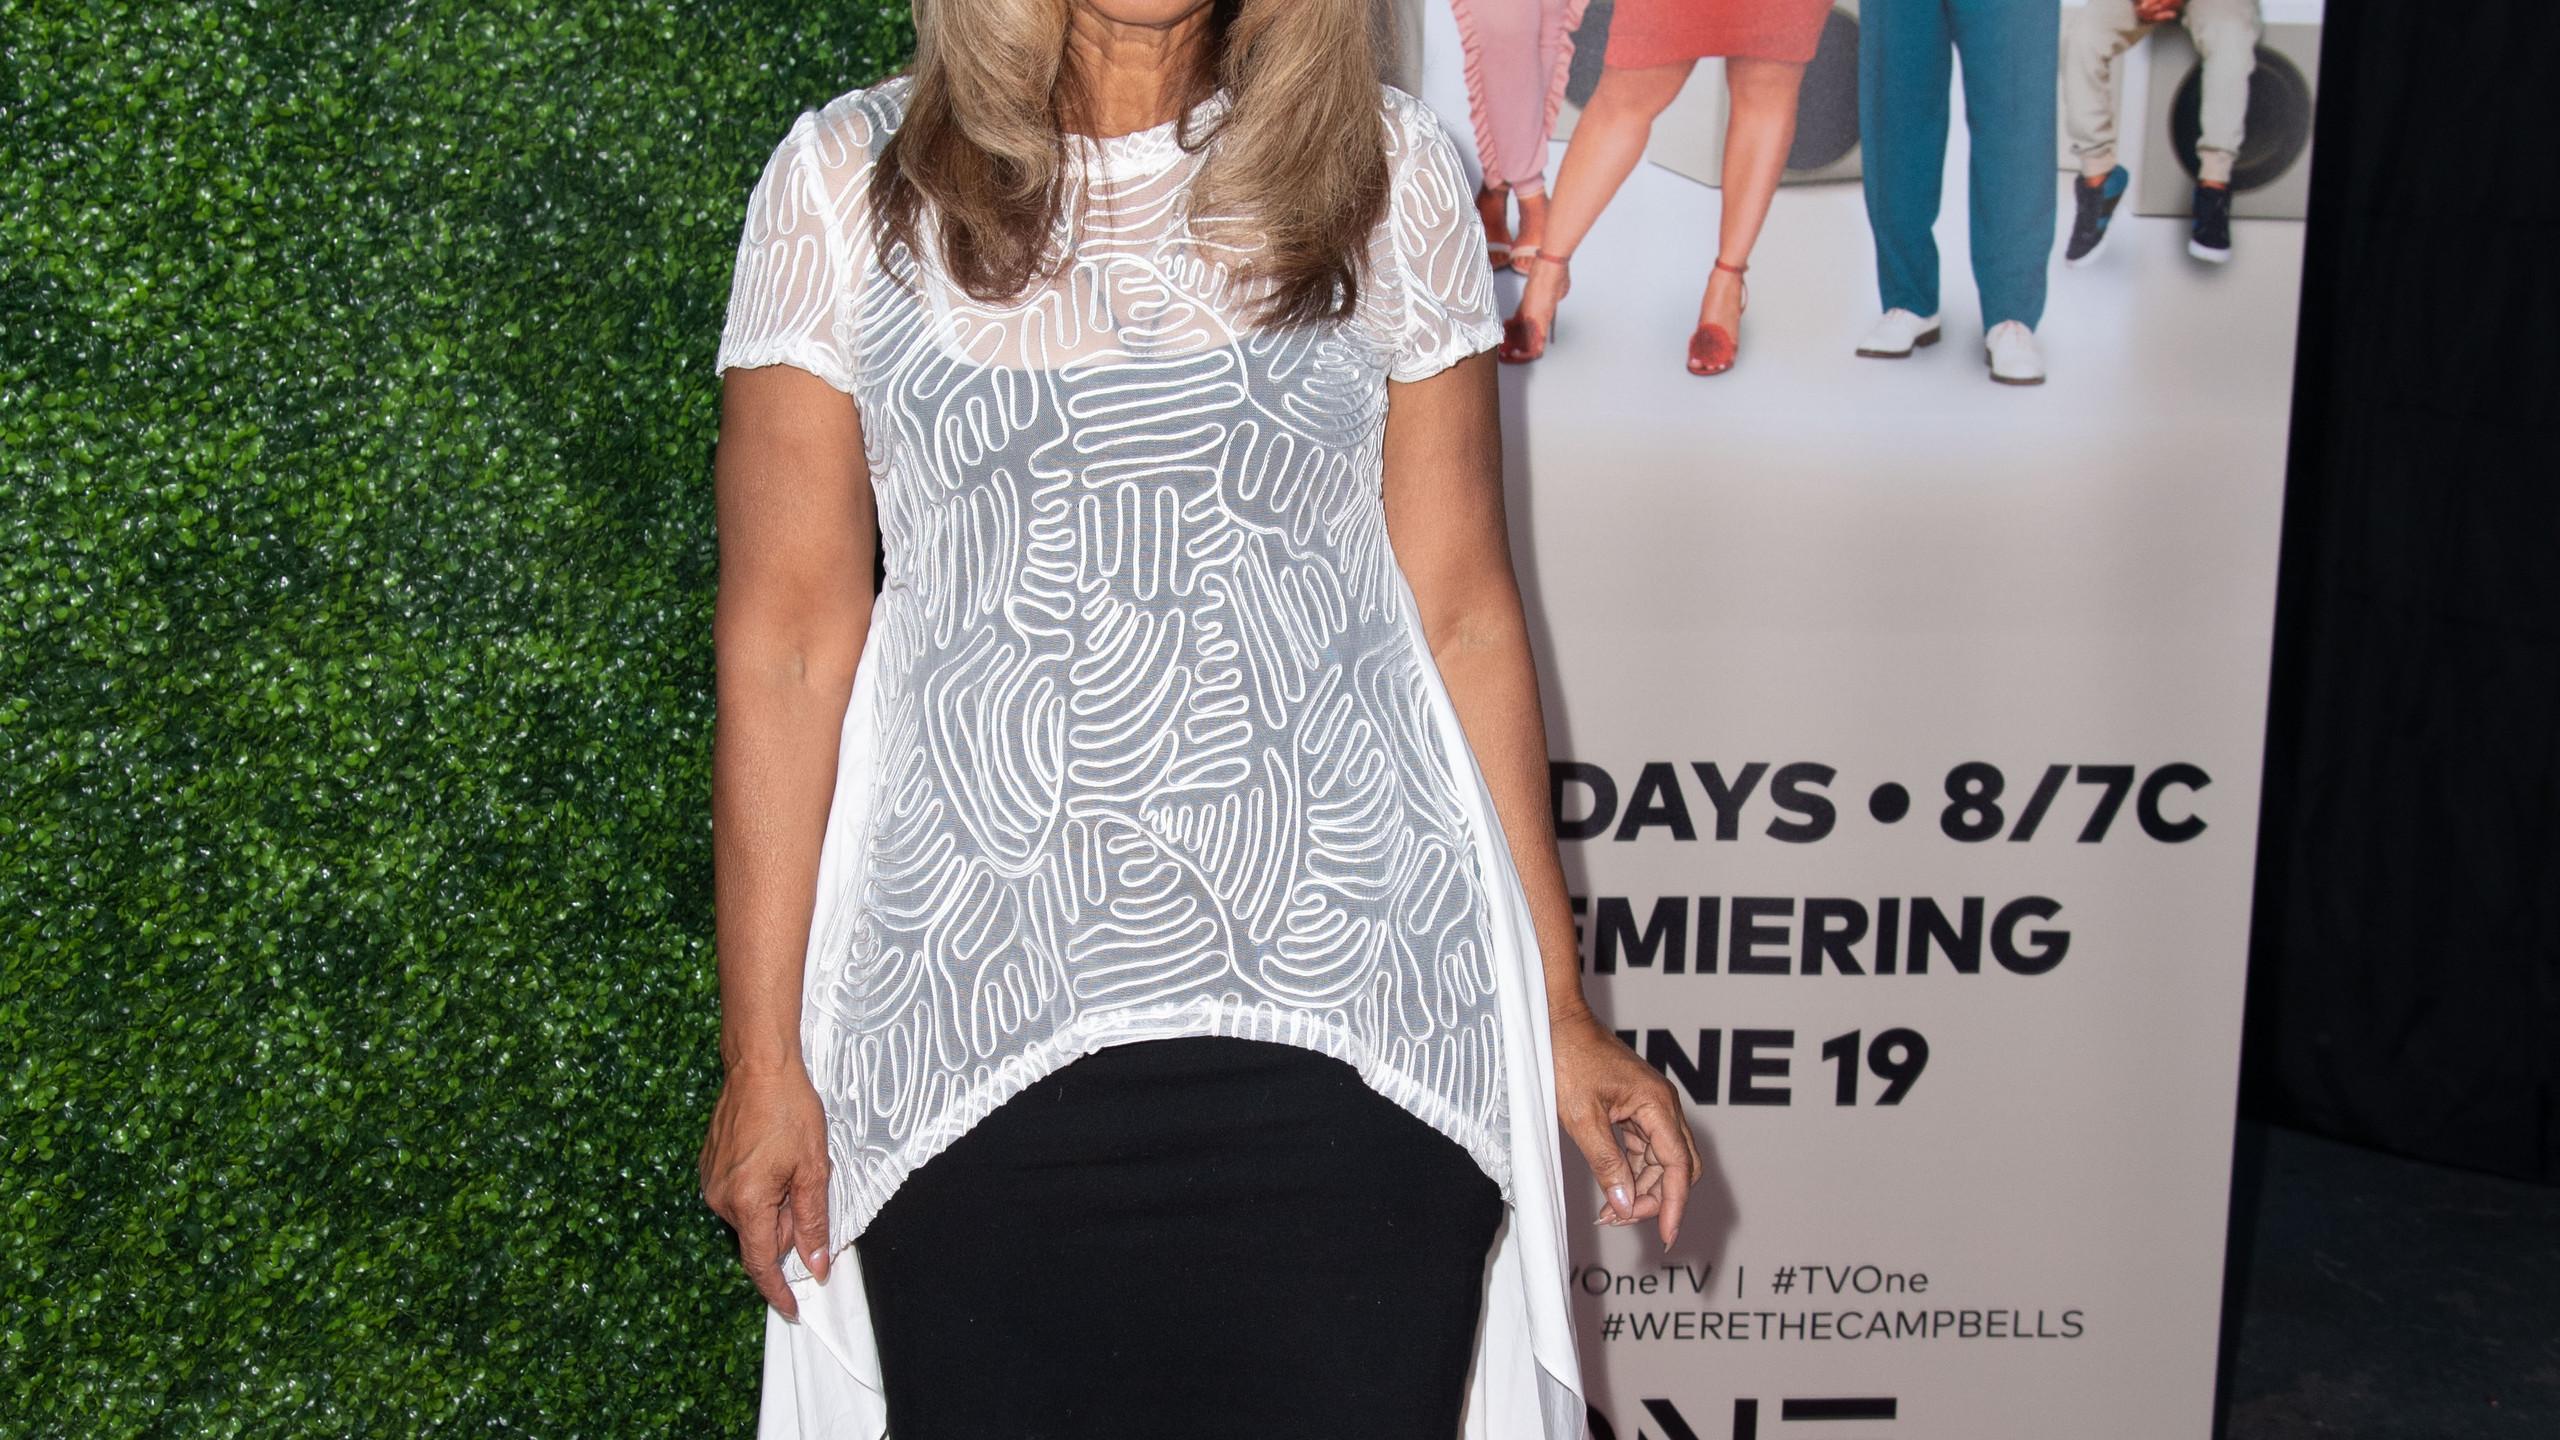 Ms Honey Atkins